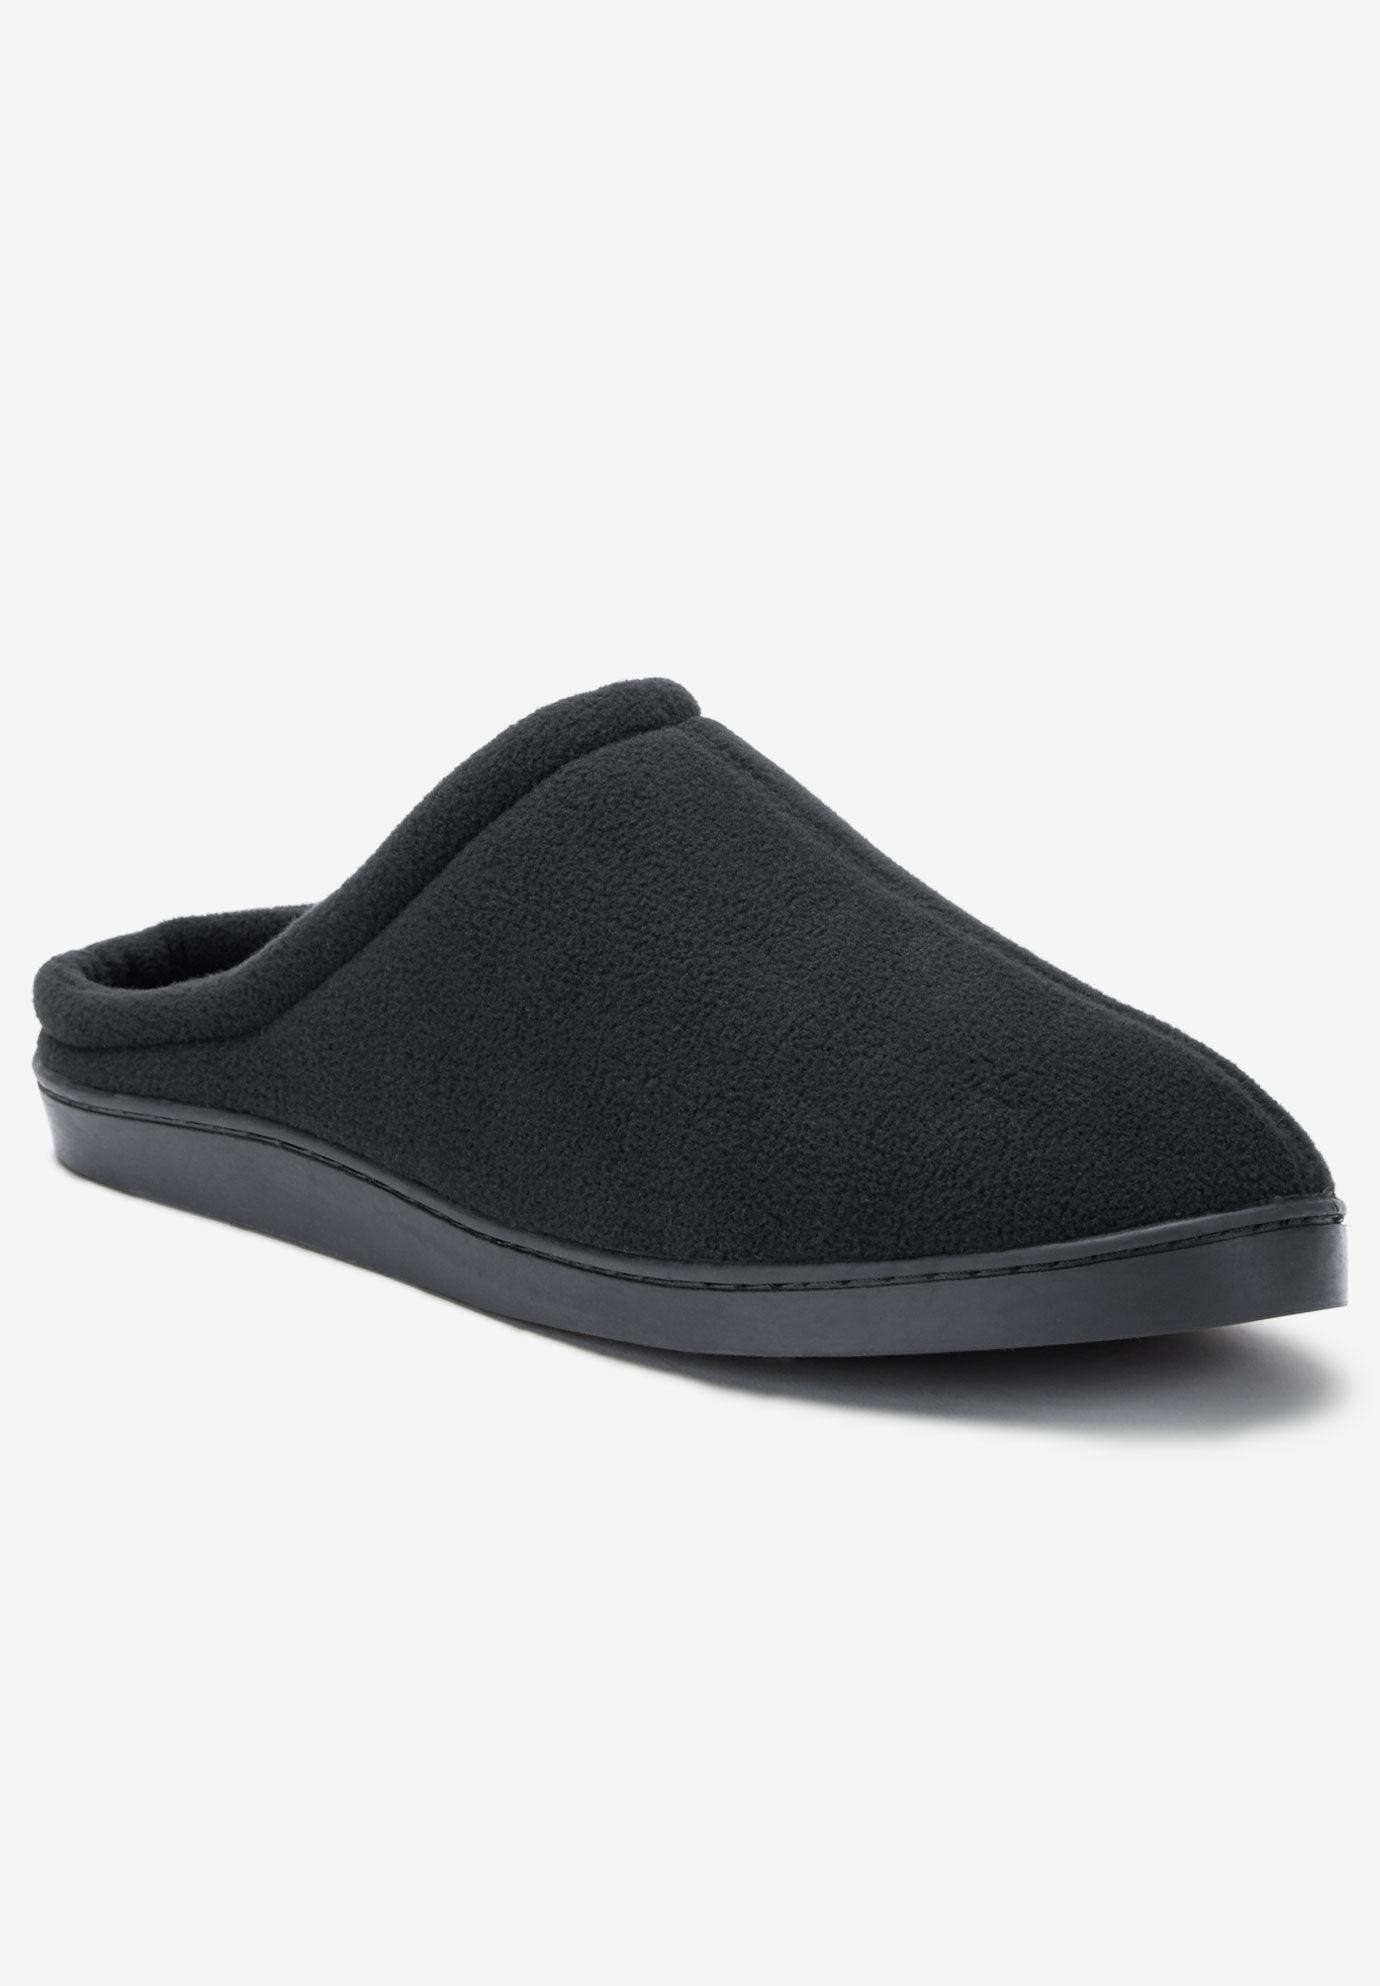 Wide Width Slippers for Men | King Size